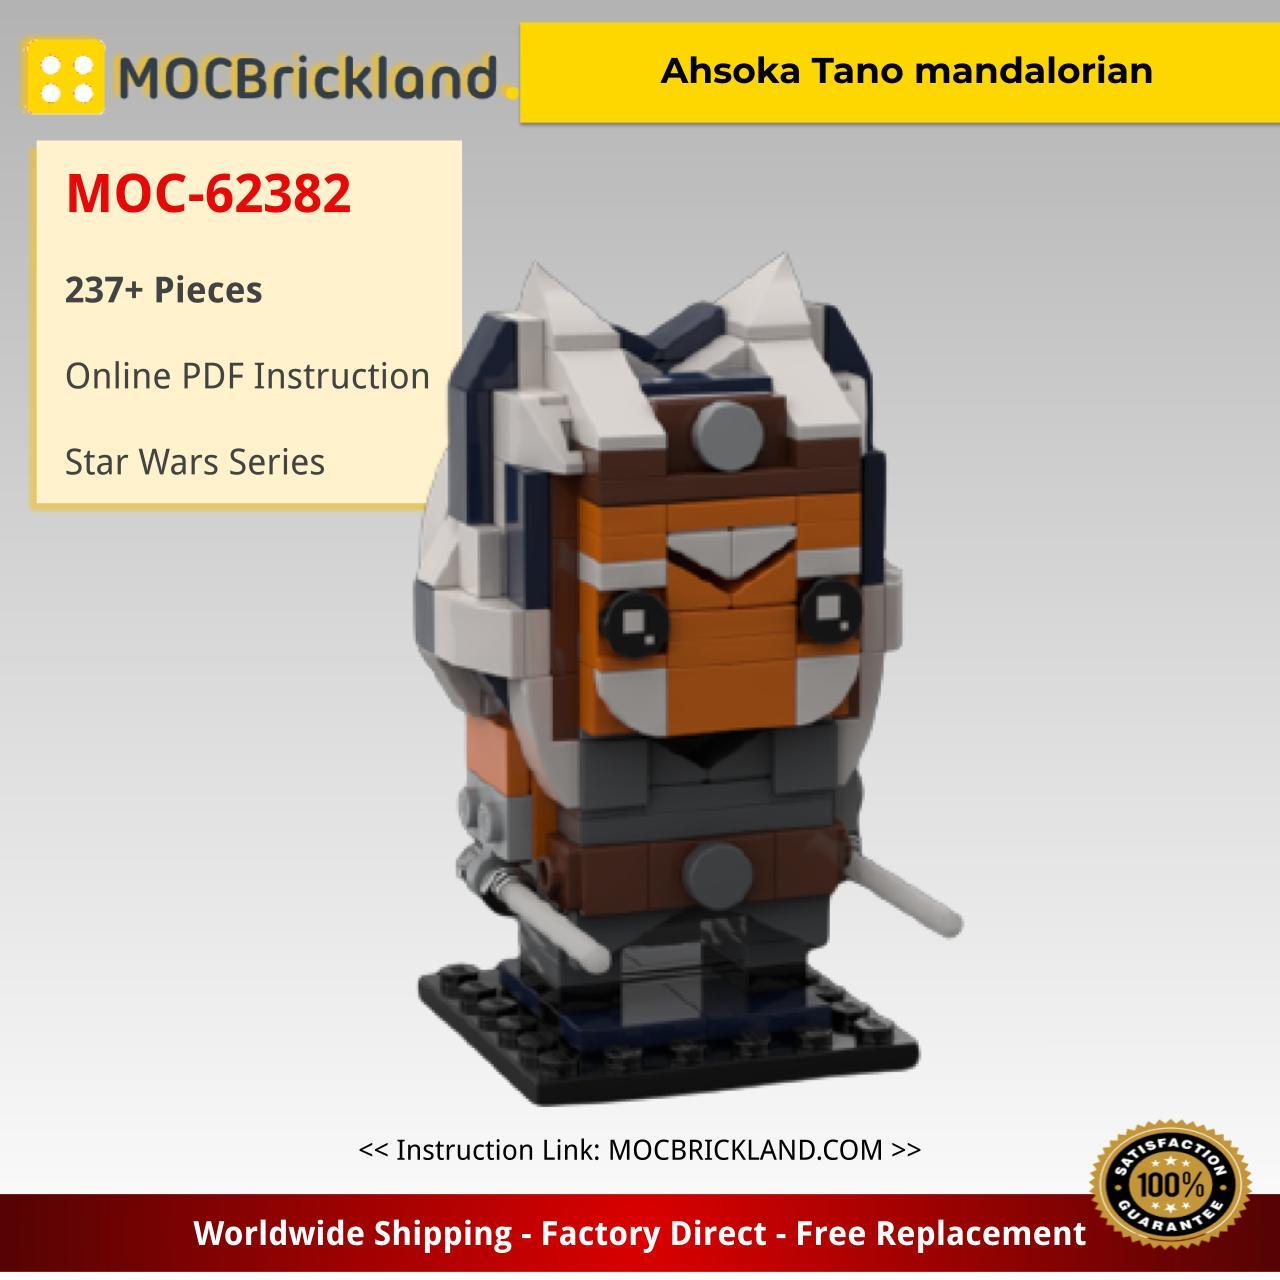 Ahsoka Tano mandalorian Star Wars MOC-62382 by mandroid99 with 237 Pieces